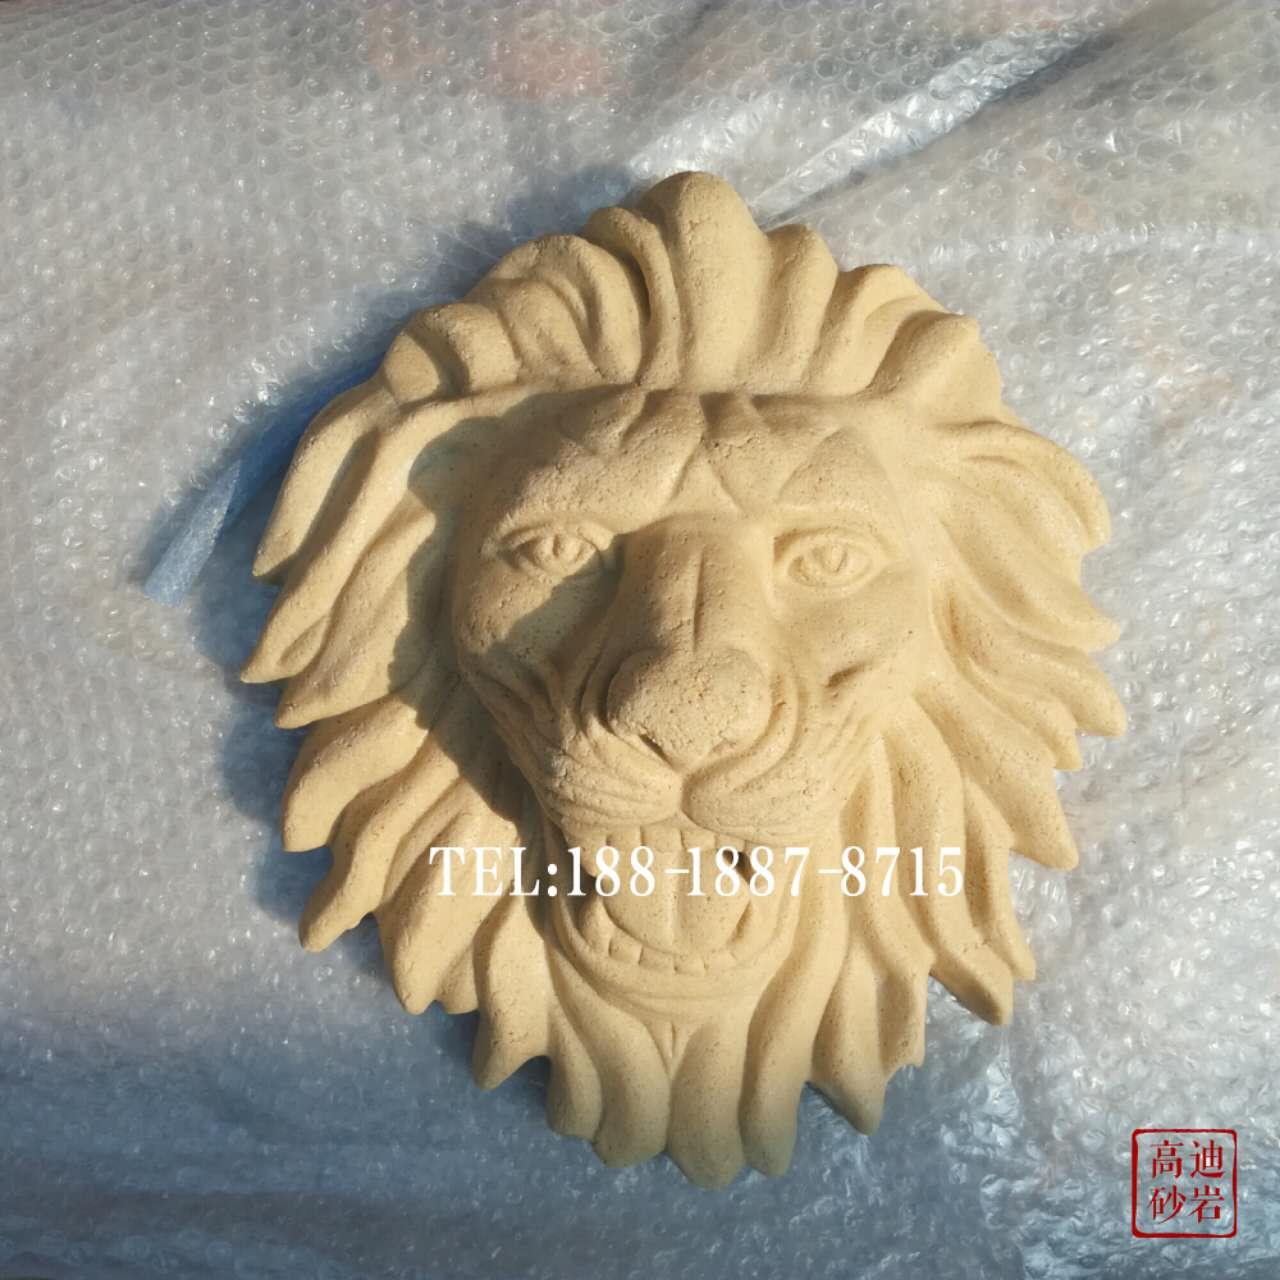 USD 35.00] Gaudi Sandstone sculpture relief Sandstone pendant Lion ...